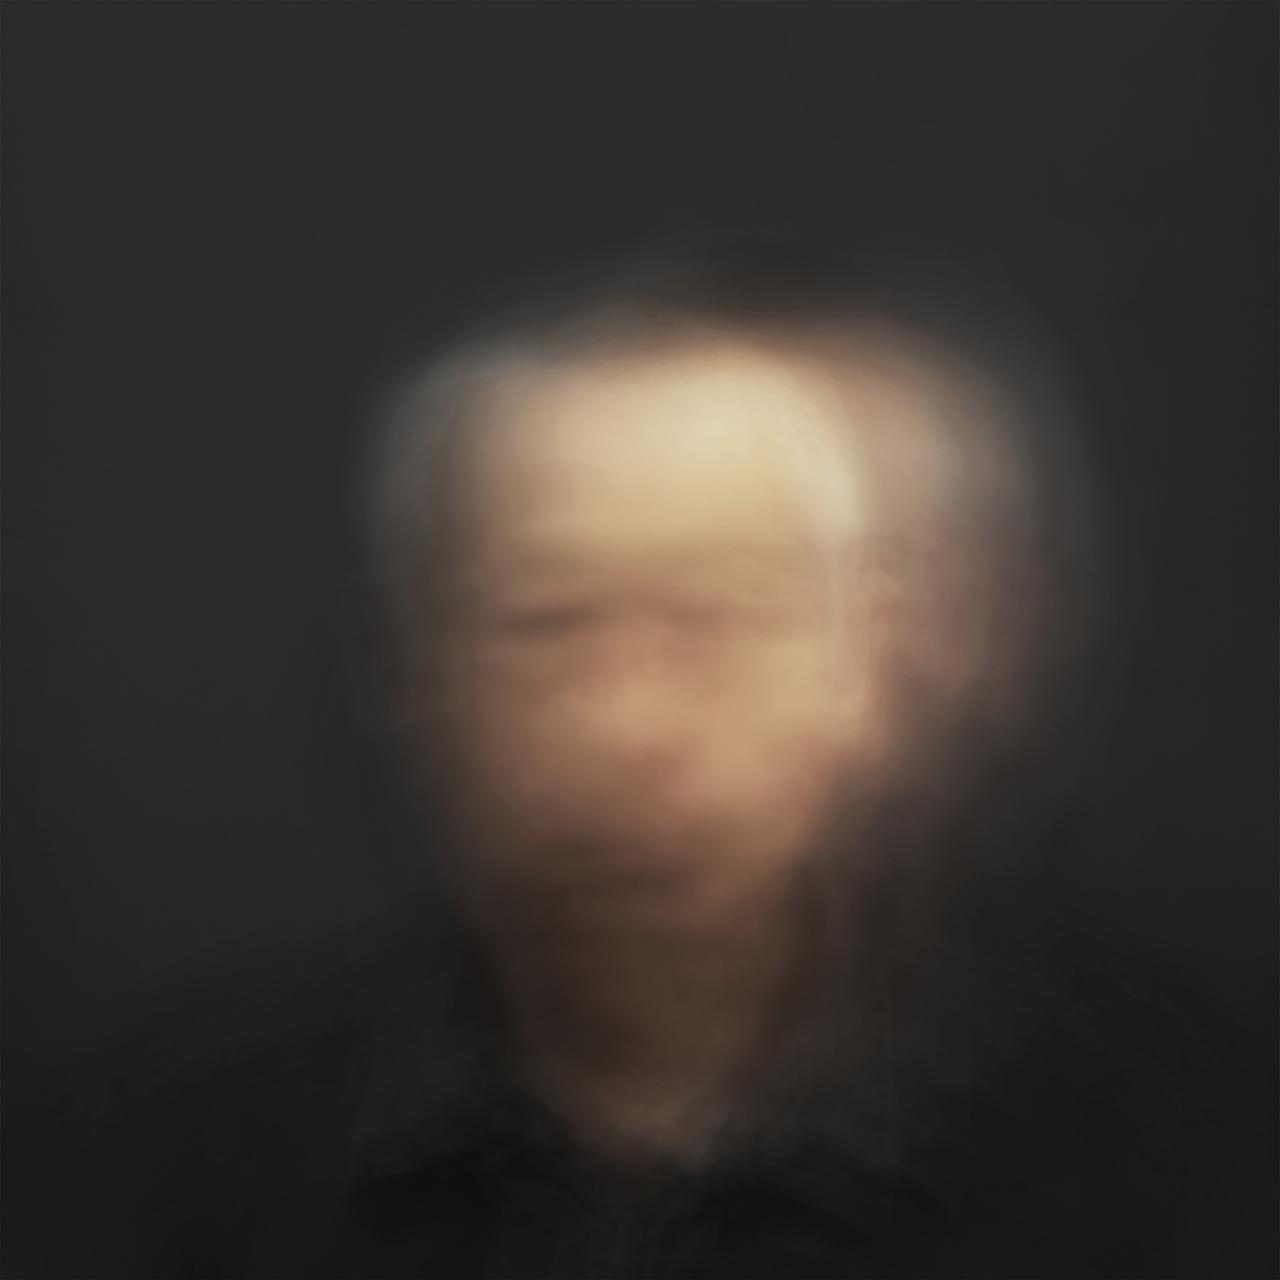 CYRUS TANG   Still Life (107 minutes)  2018 Archival pigment print 65 x 65 cm